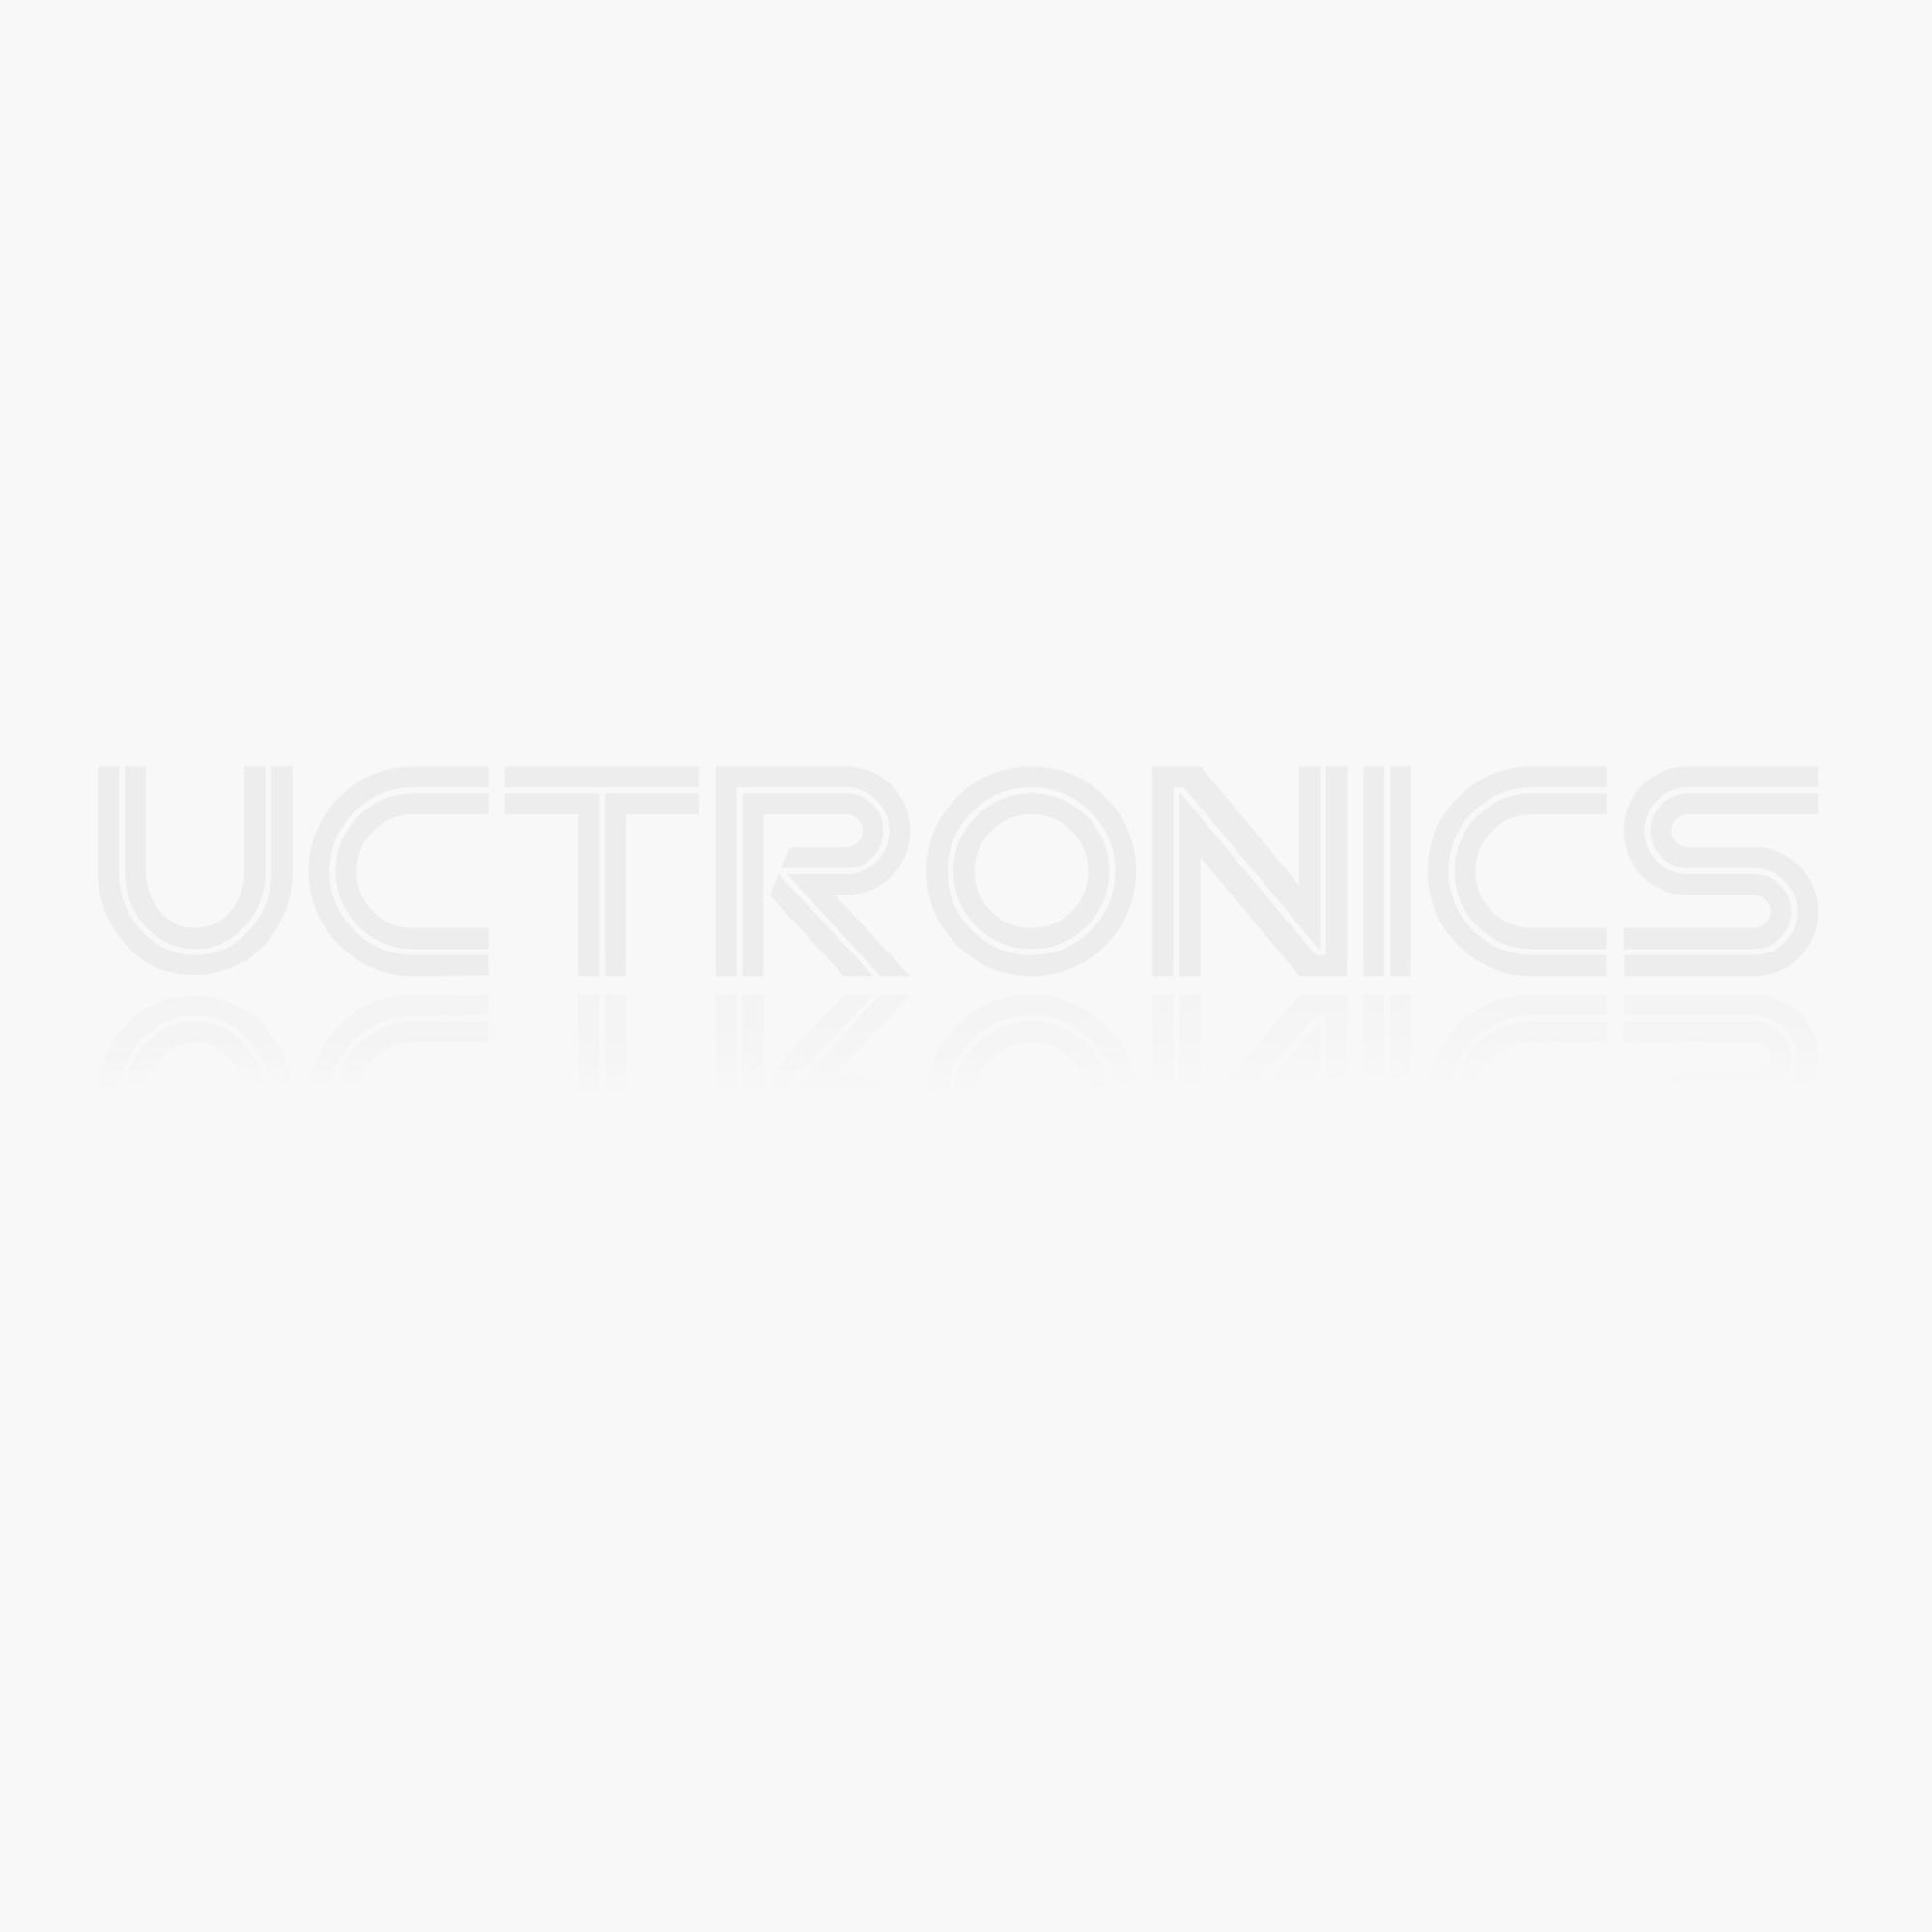 TSL2561 Digital Light Luminosity Sensor Module for Arduino